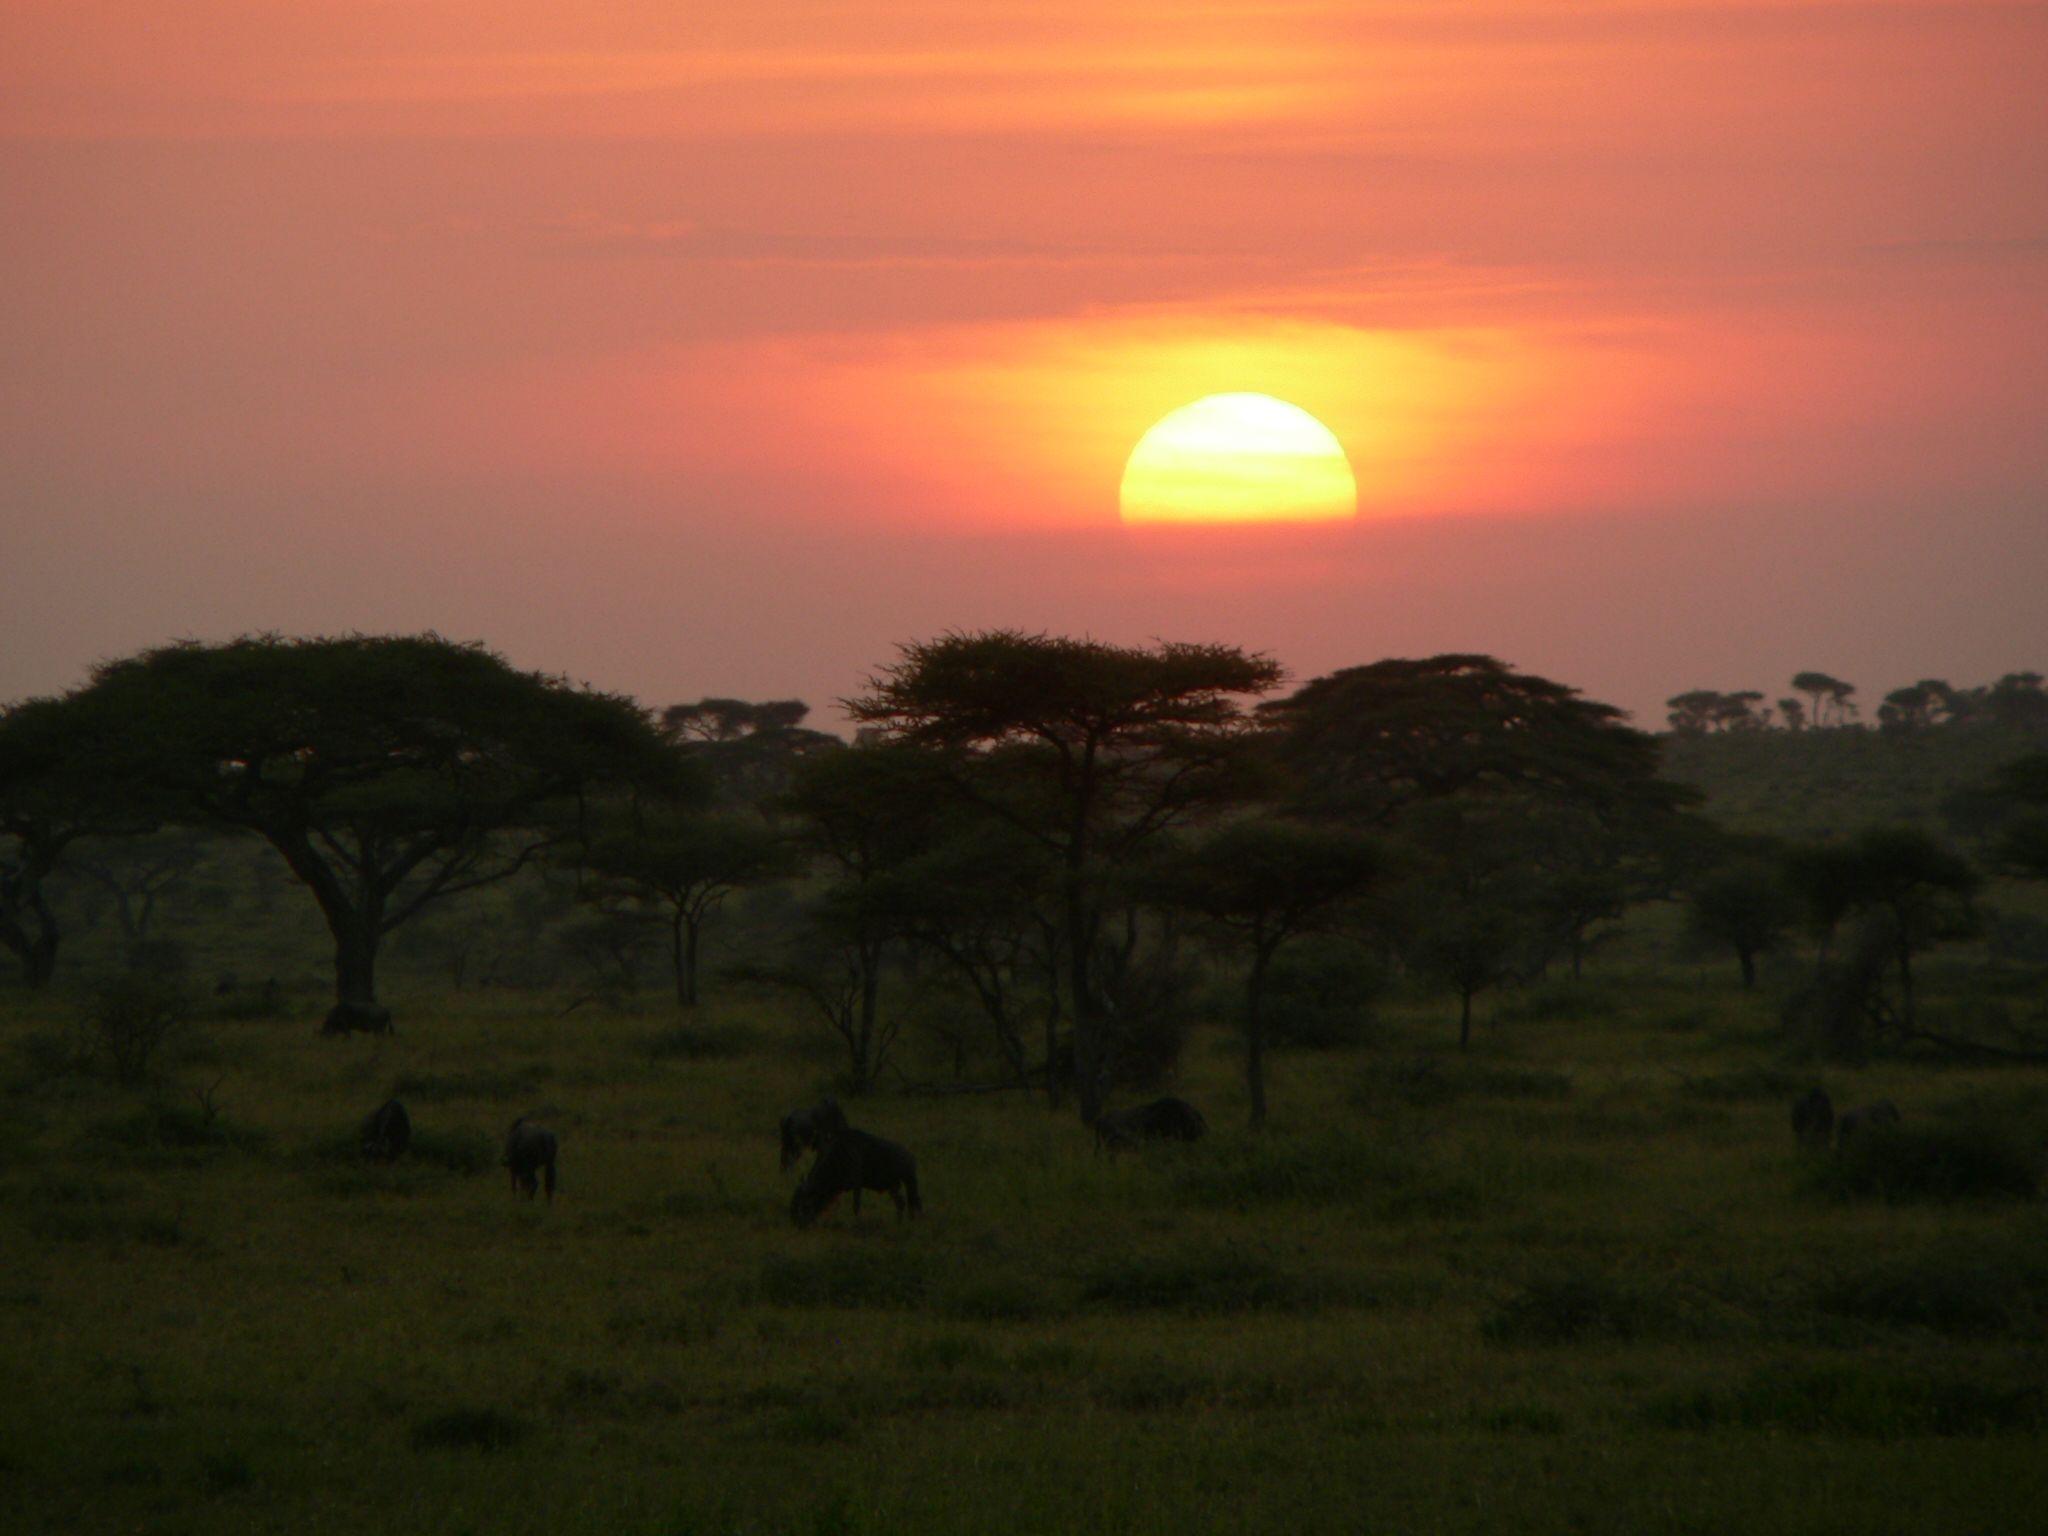 Pin By Elangeni African Adventures On Tansania Das Herz Von Afrika Celestial Outdoor Sunset